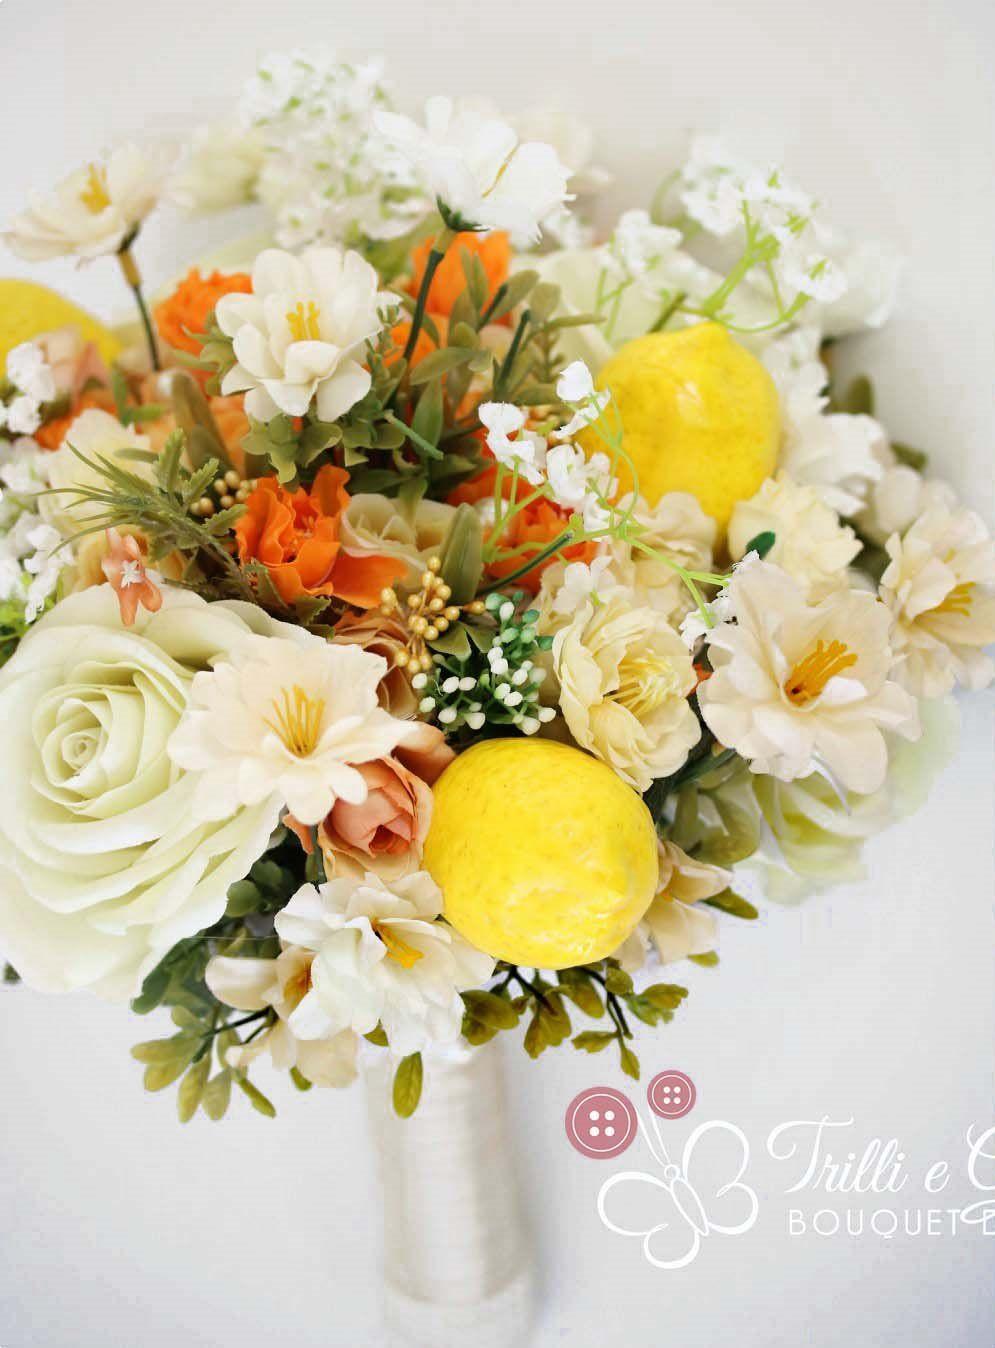 Bouquet Con Frutta Limoni Matrimoni A Tema Matrimonio Bouquet